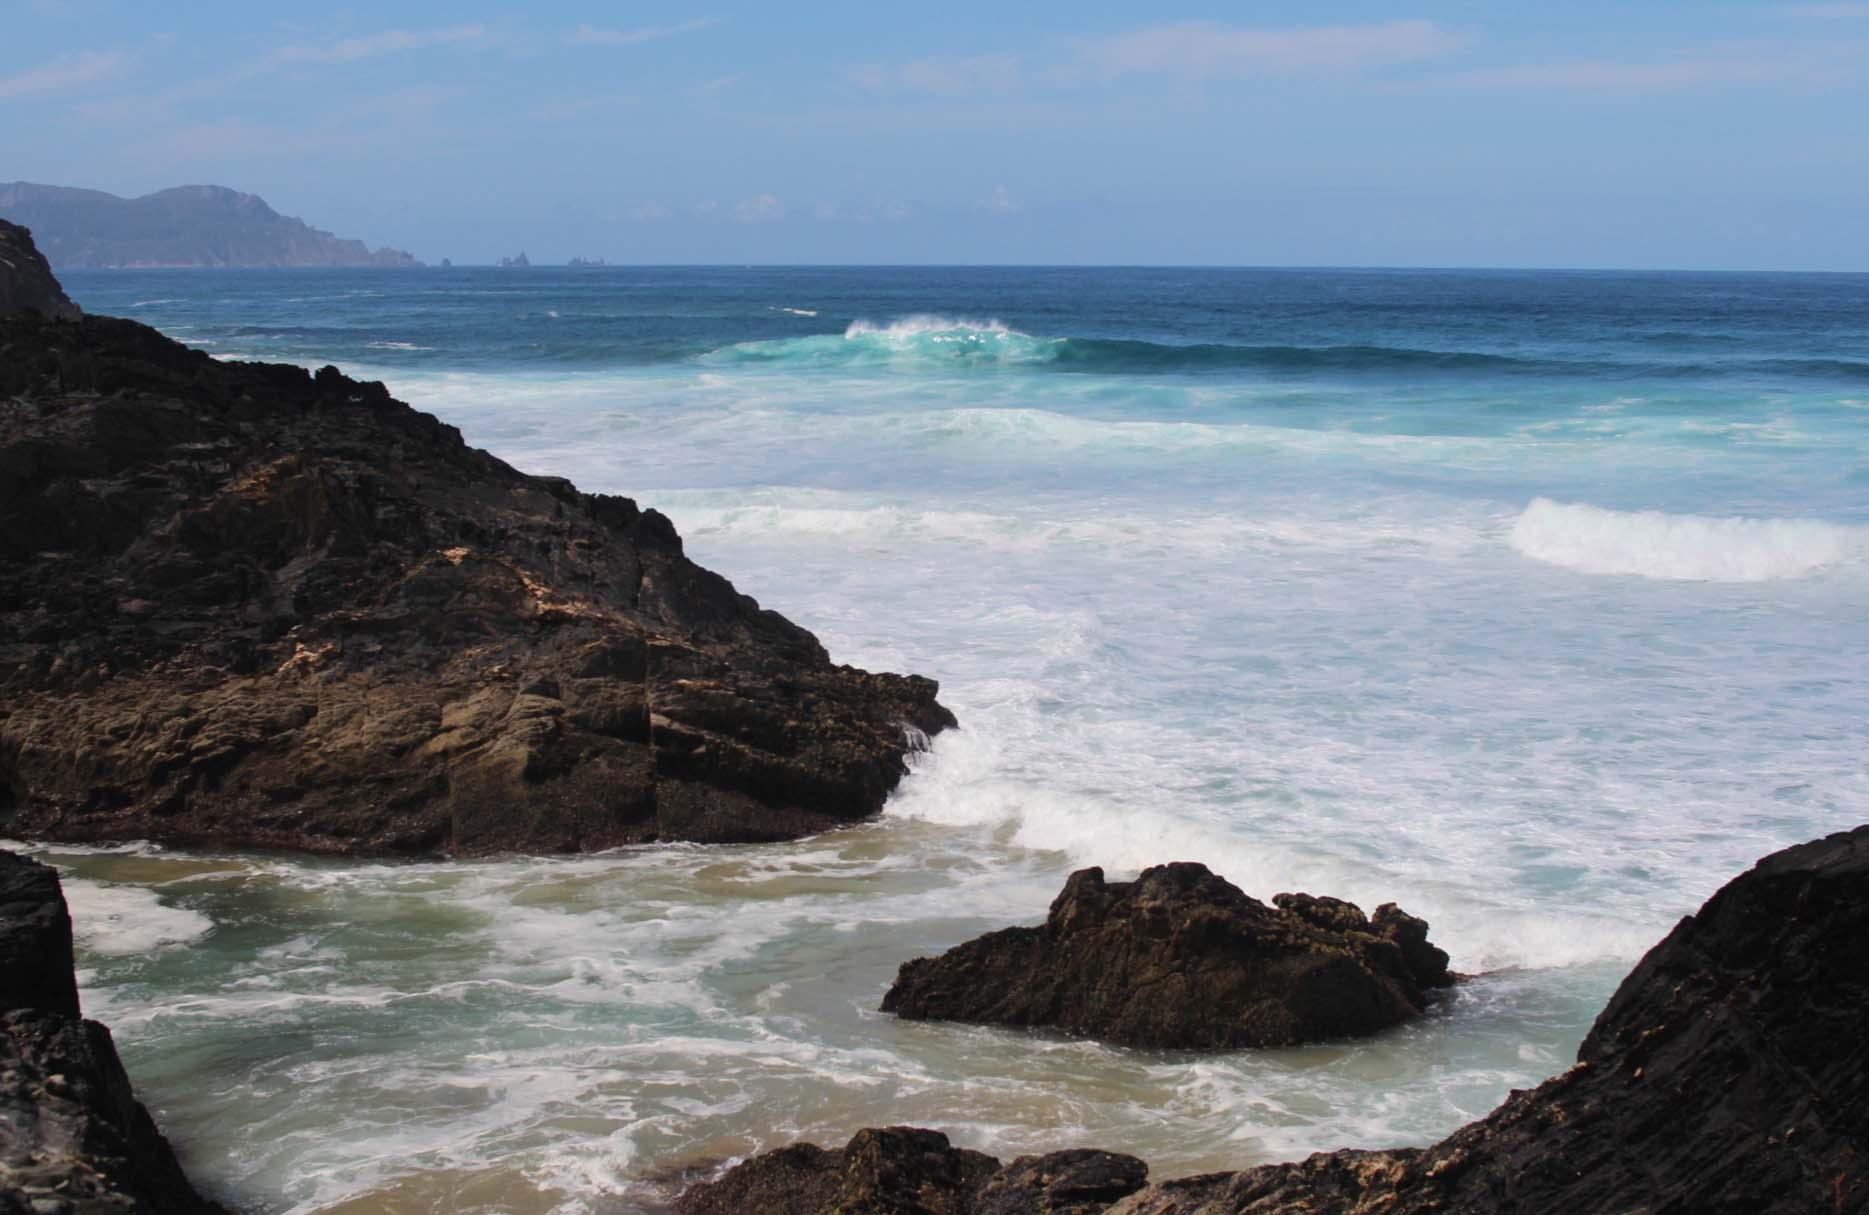 plage surf vagues galice 3